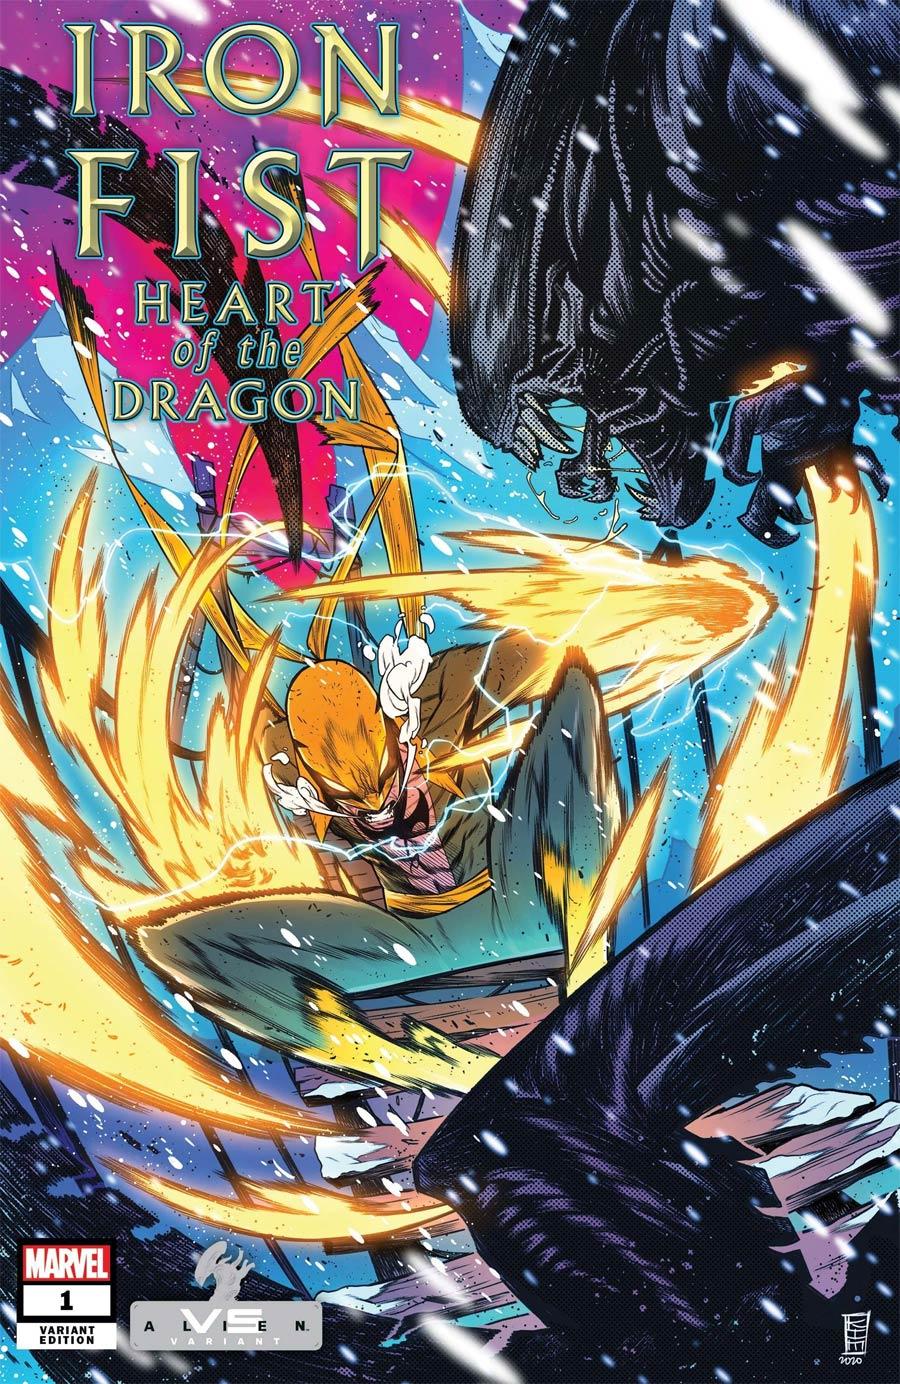 Iron Fist Heart Of The Dragon #1 Cover B Variant Kim Jacinto Marvel vs Alien Cover